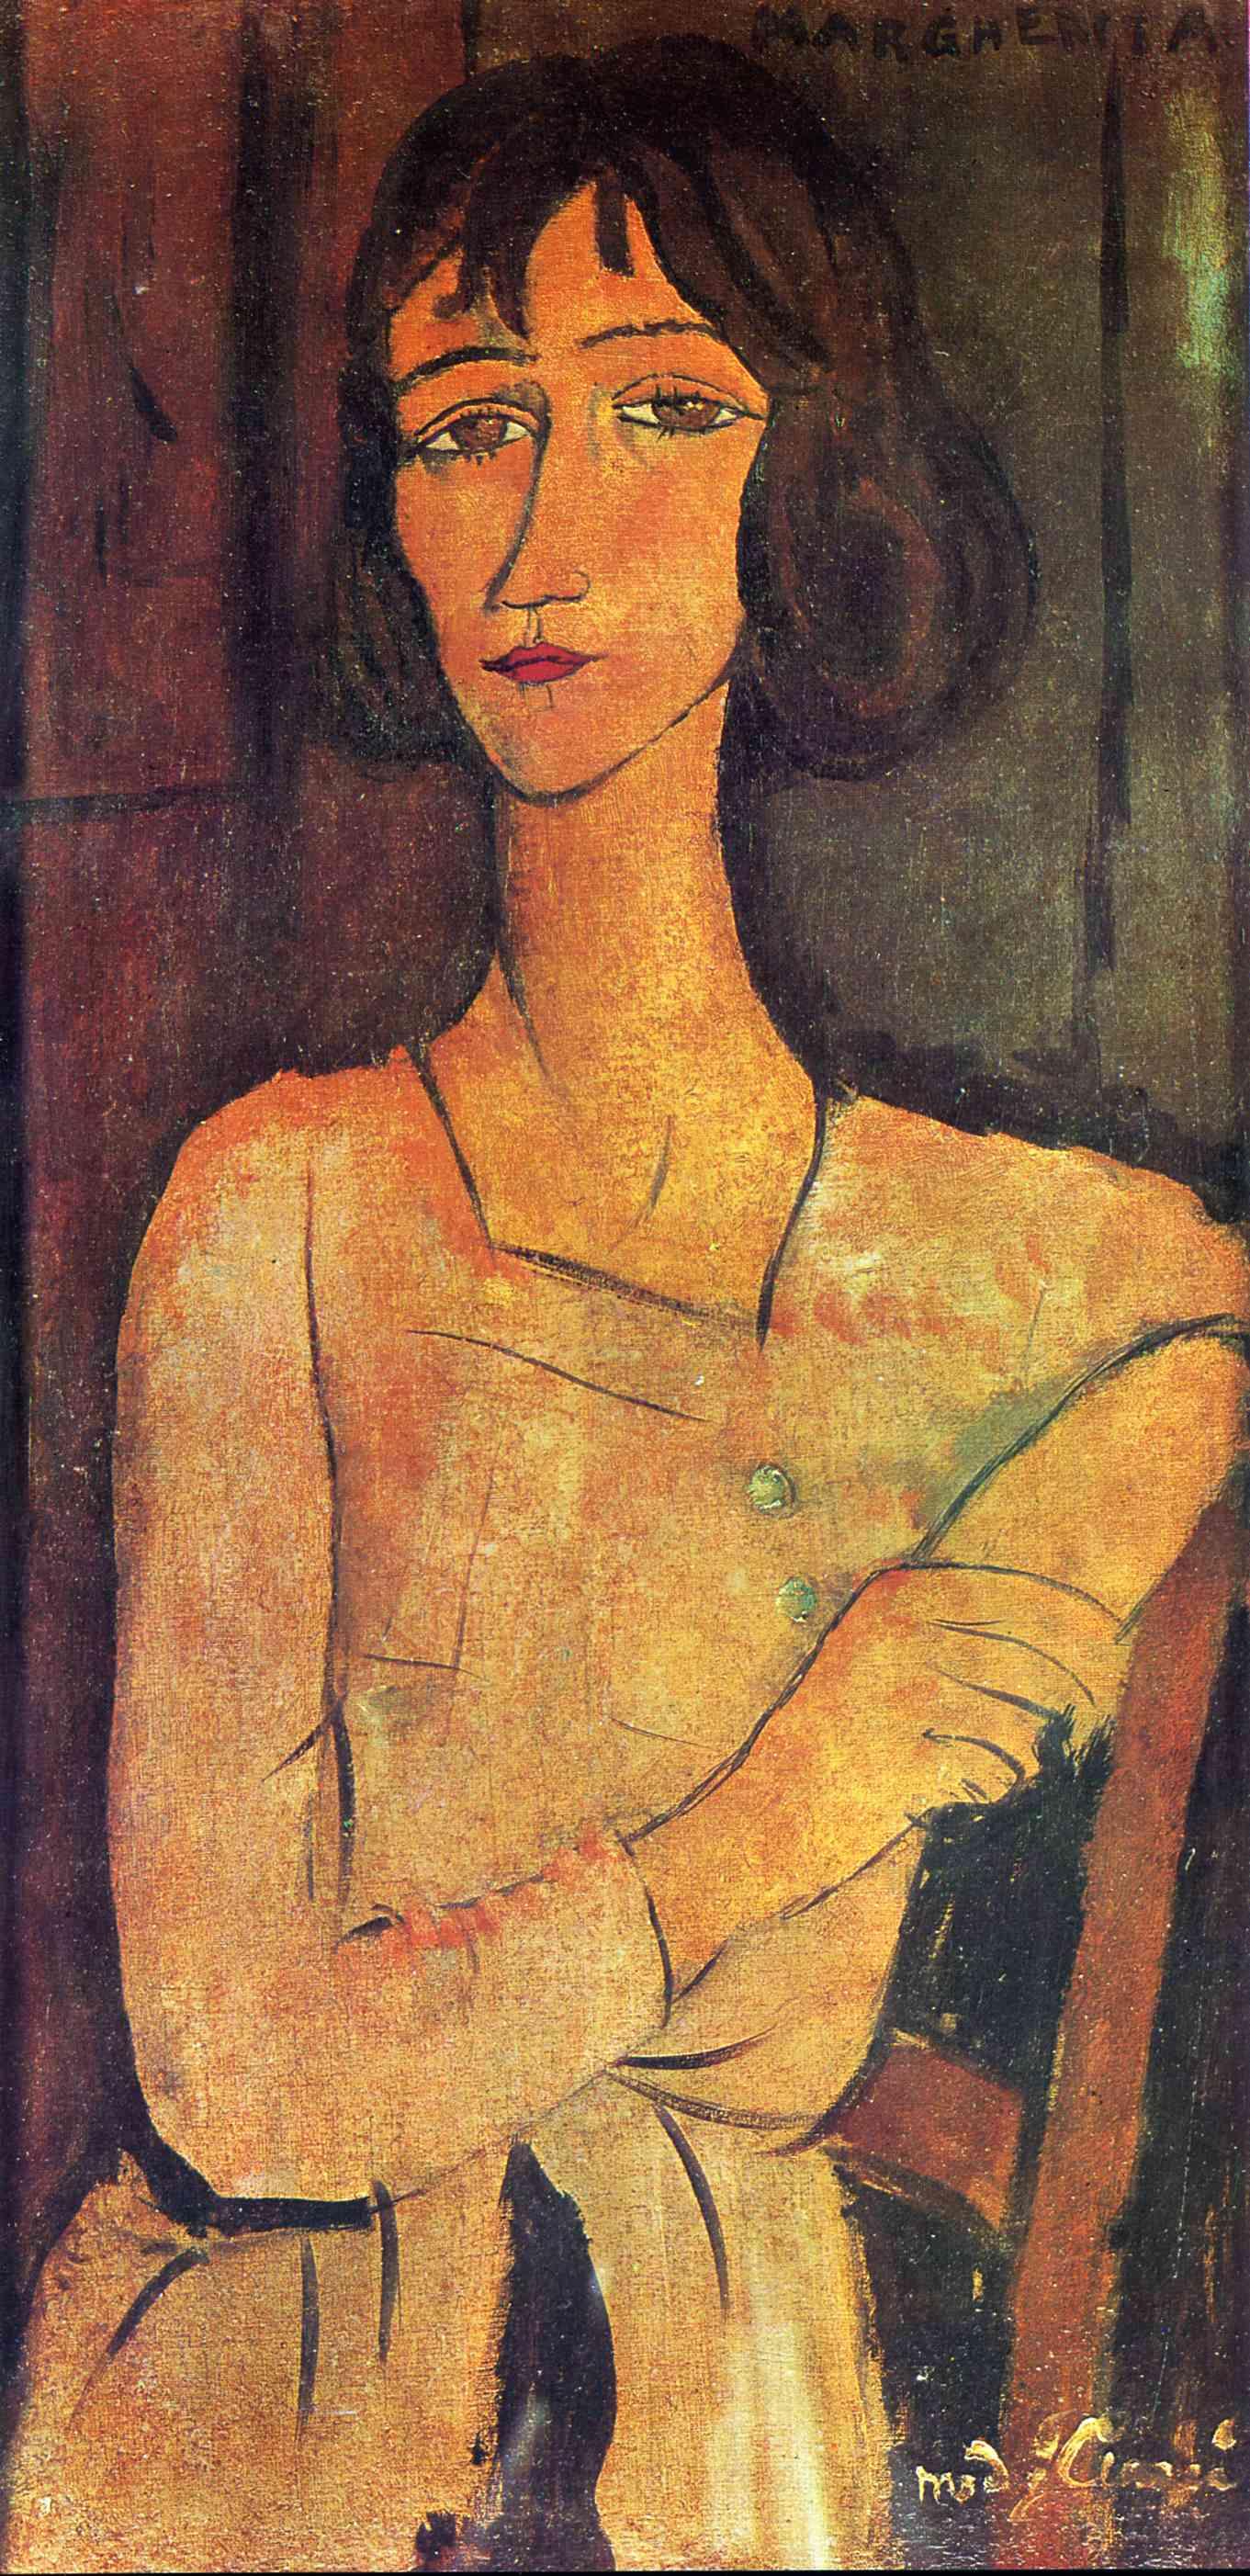 Amedeo Modigliani. Portrait of a seated Margarita